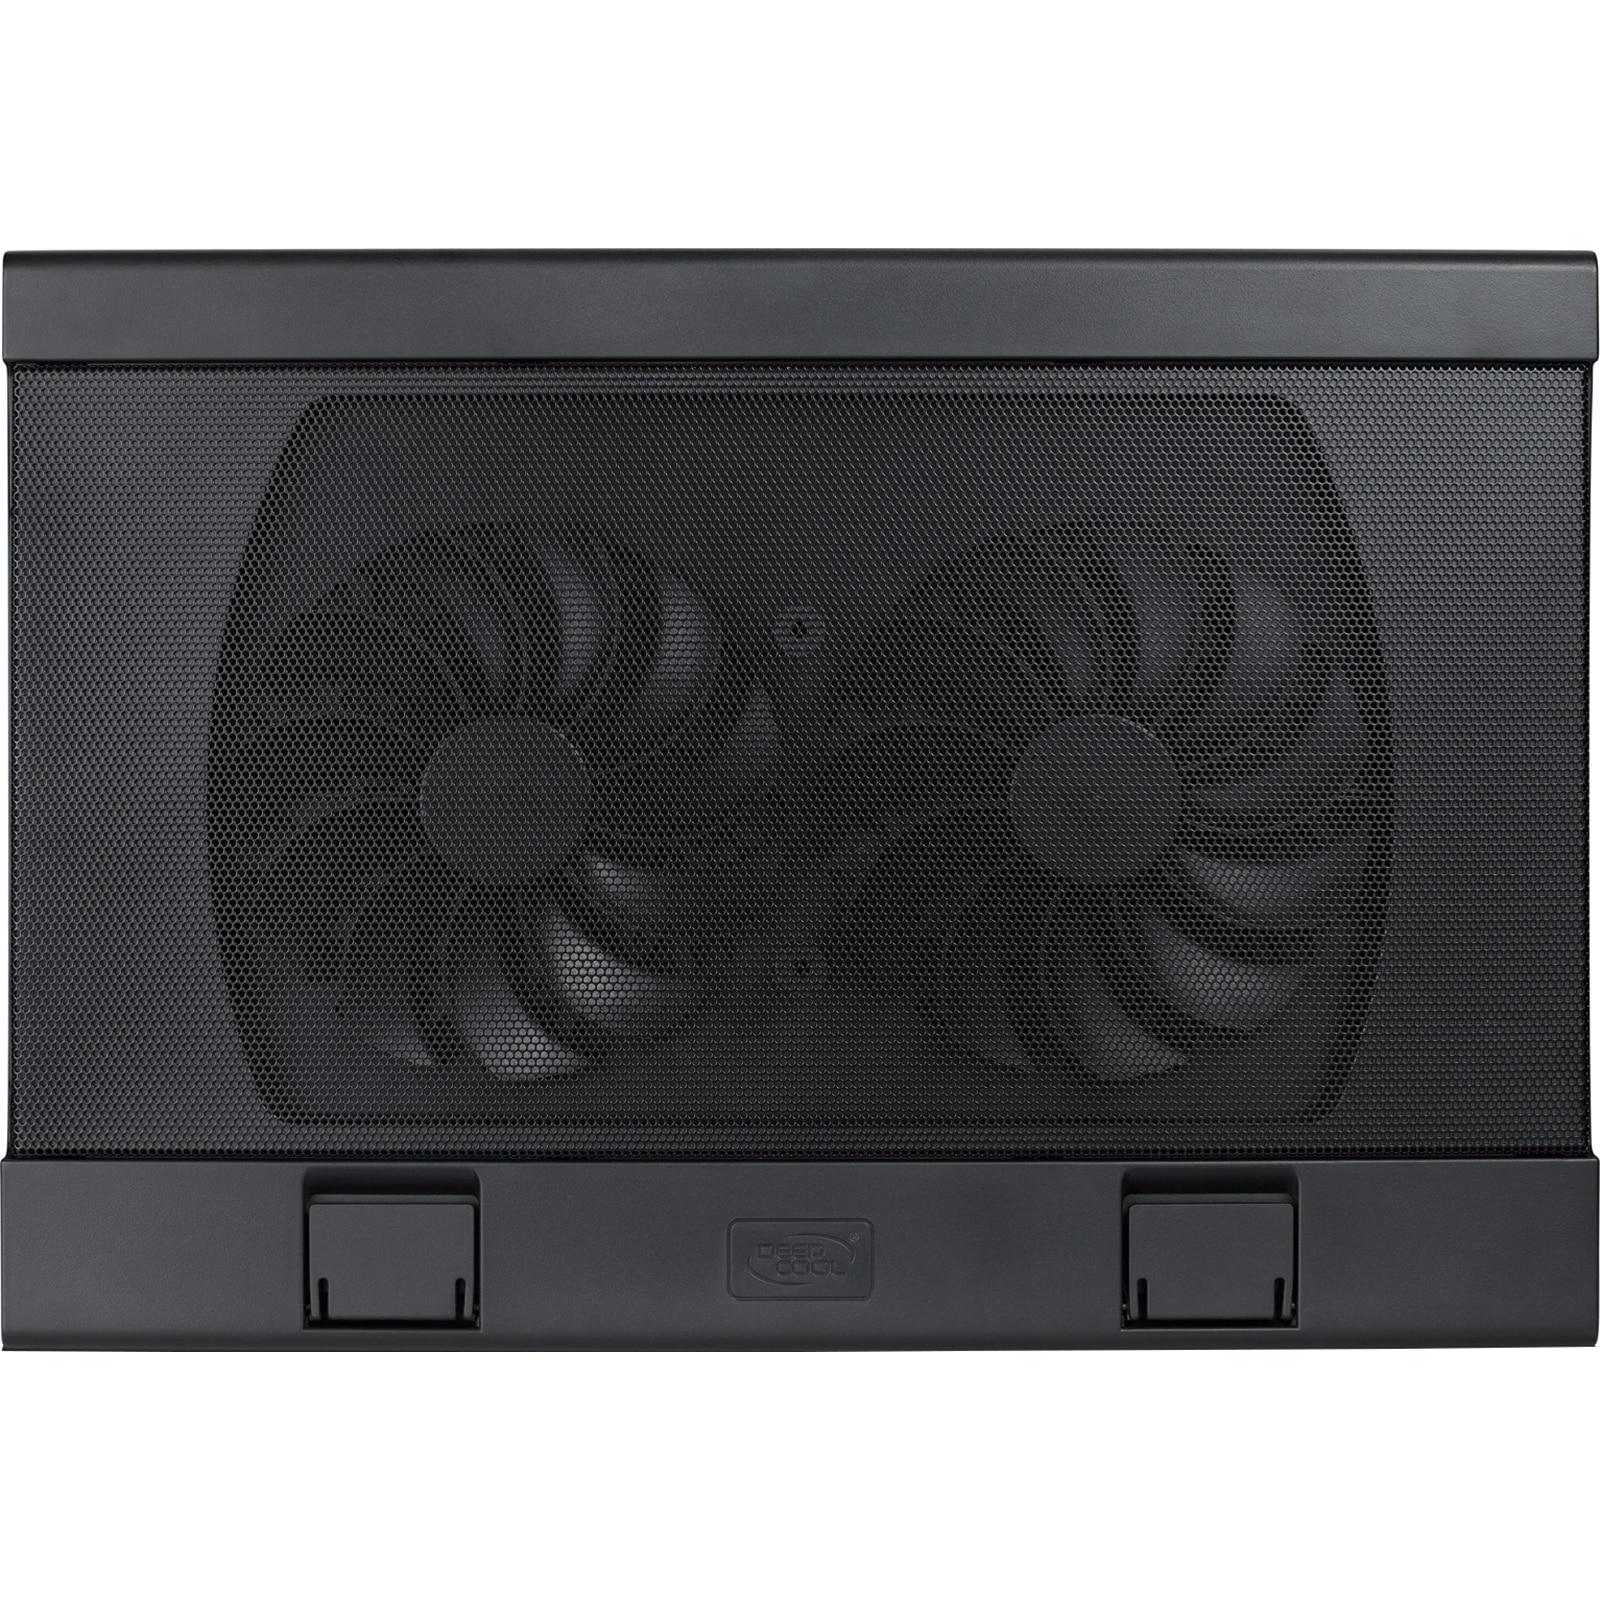 "Fotografie Cooler Laptop DeepCool Windpal, 17"", Hydro Bearing, 4 x USB"